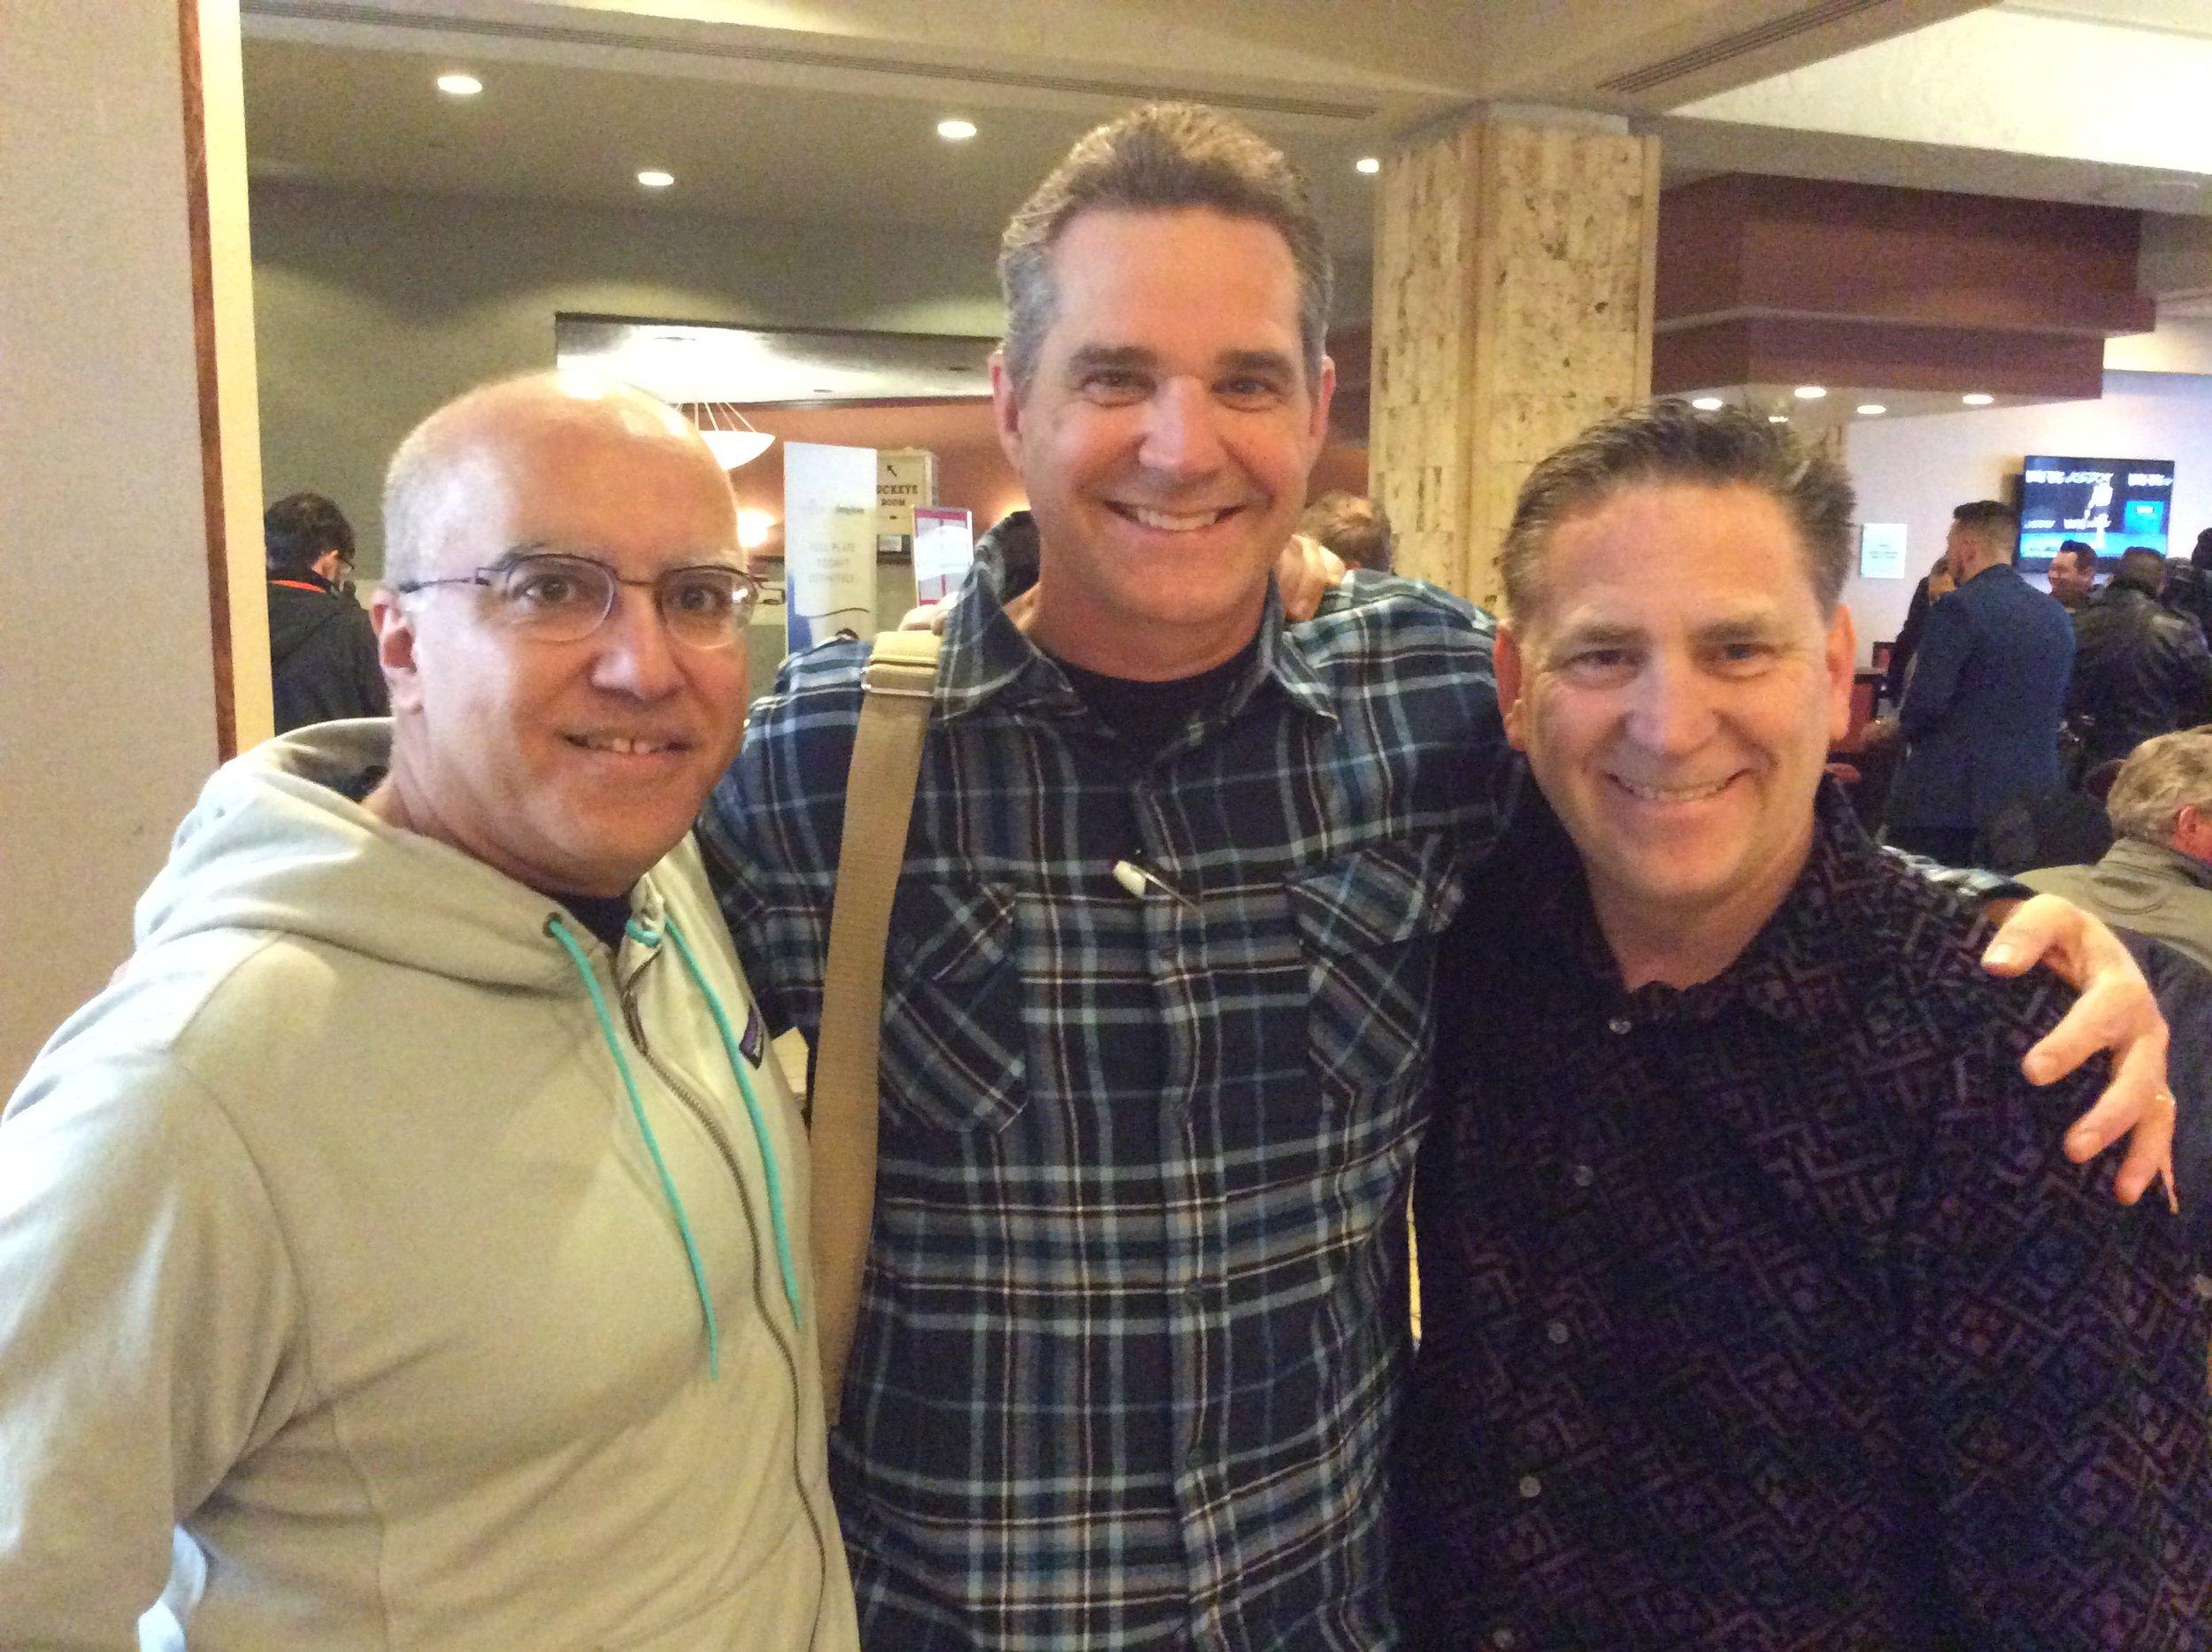 Raj Madhok, Rick Wilcox and Scott Robinson